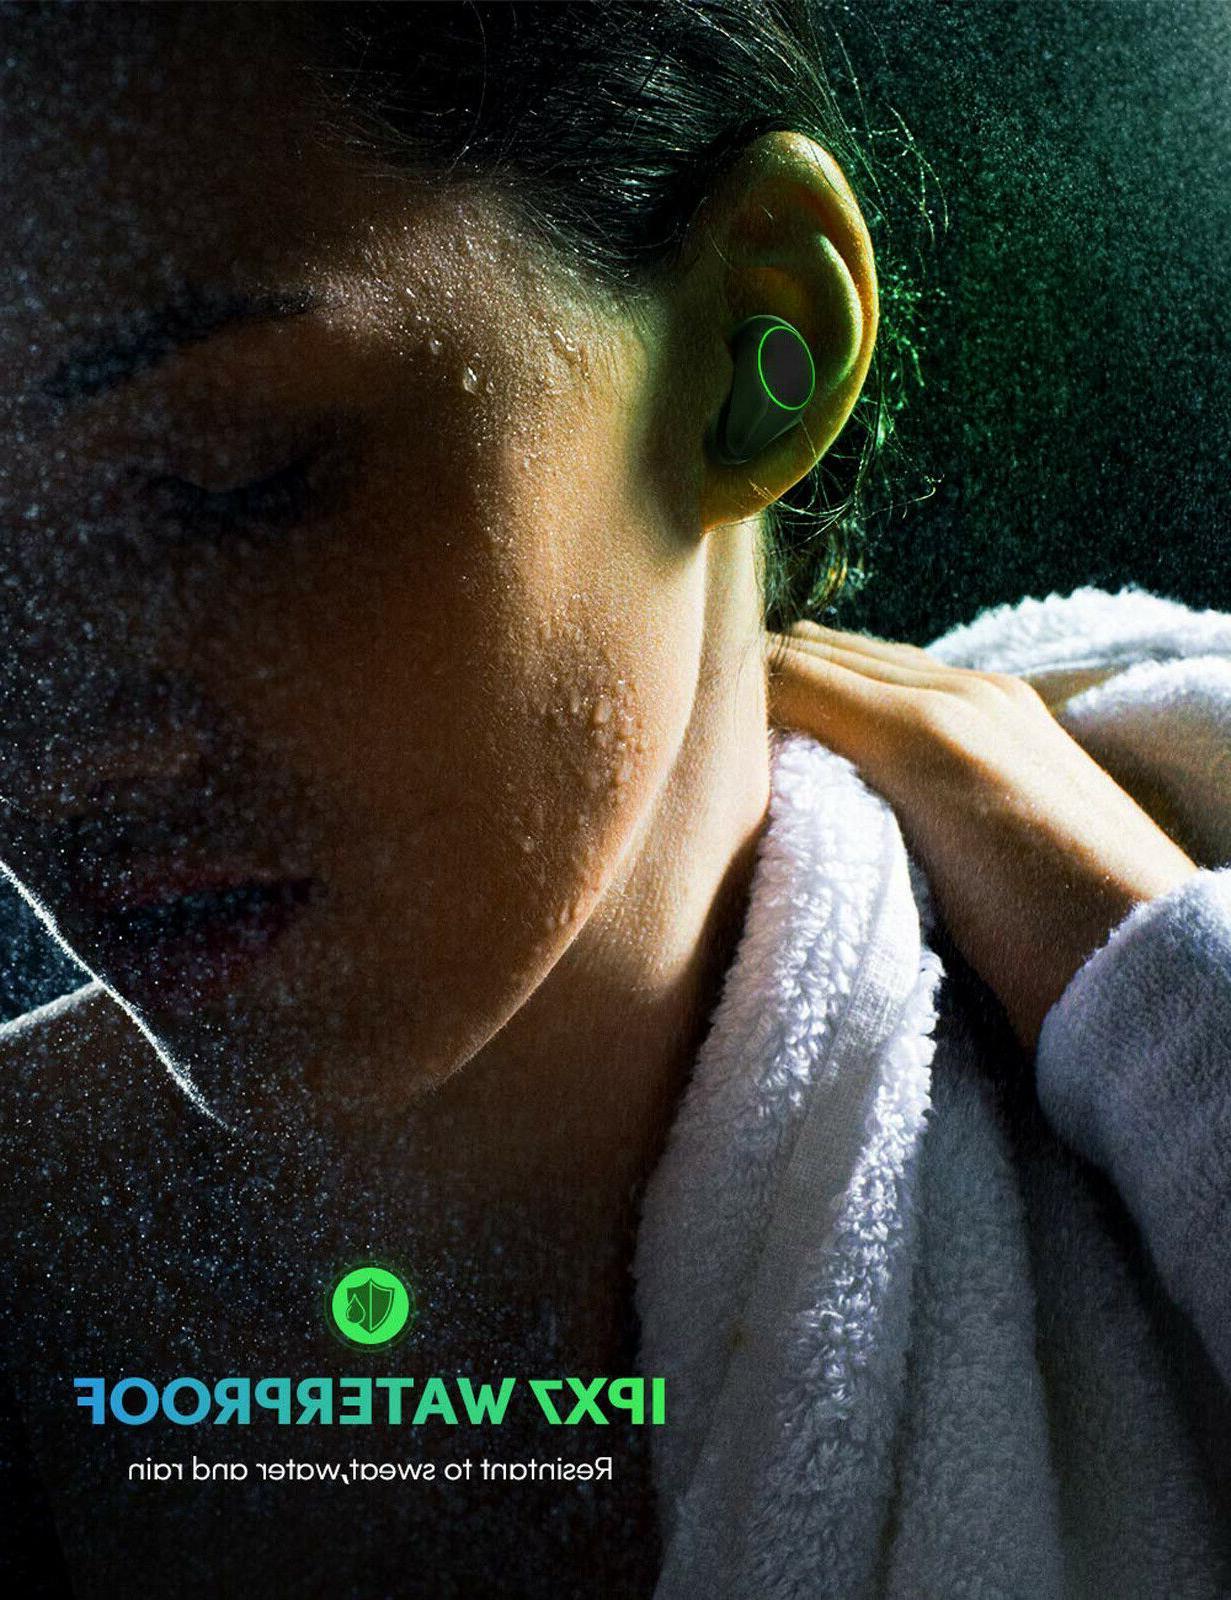 True Earbuds 5.0 Waterproof With